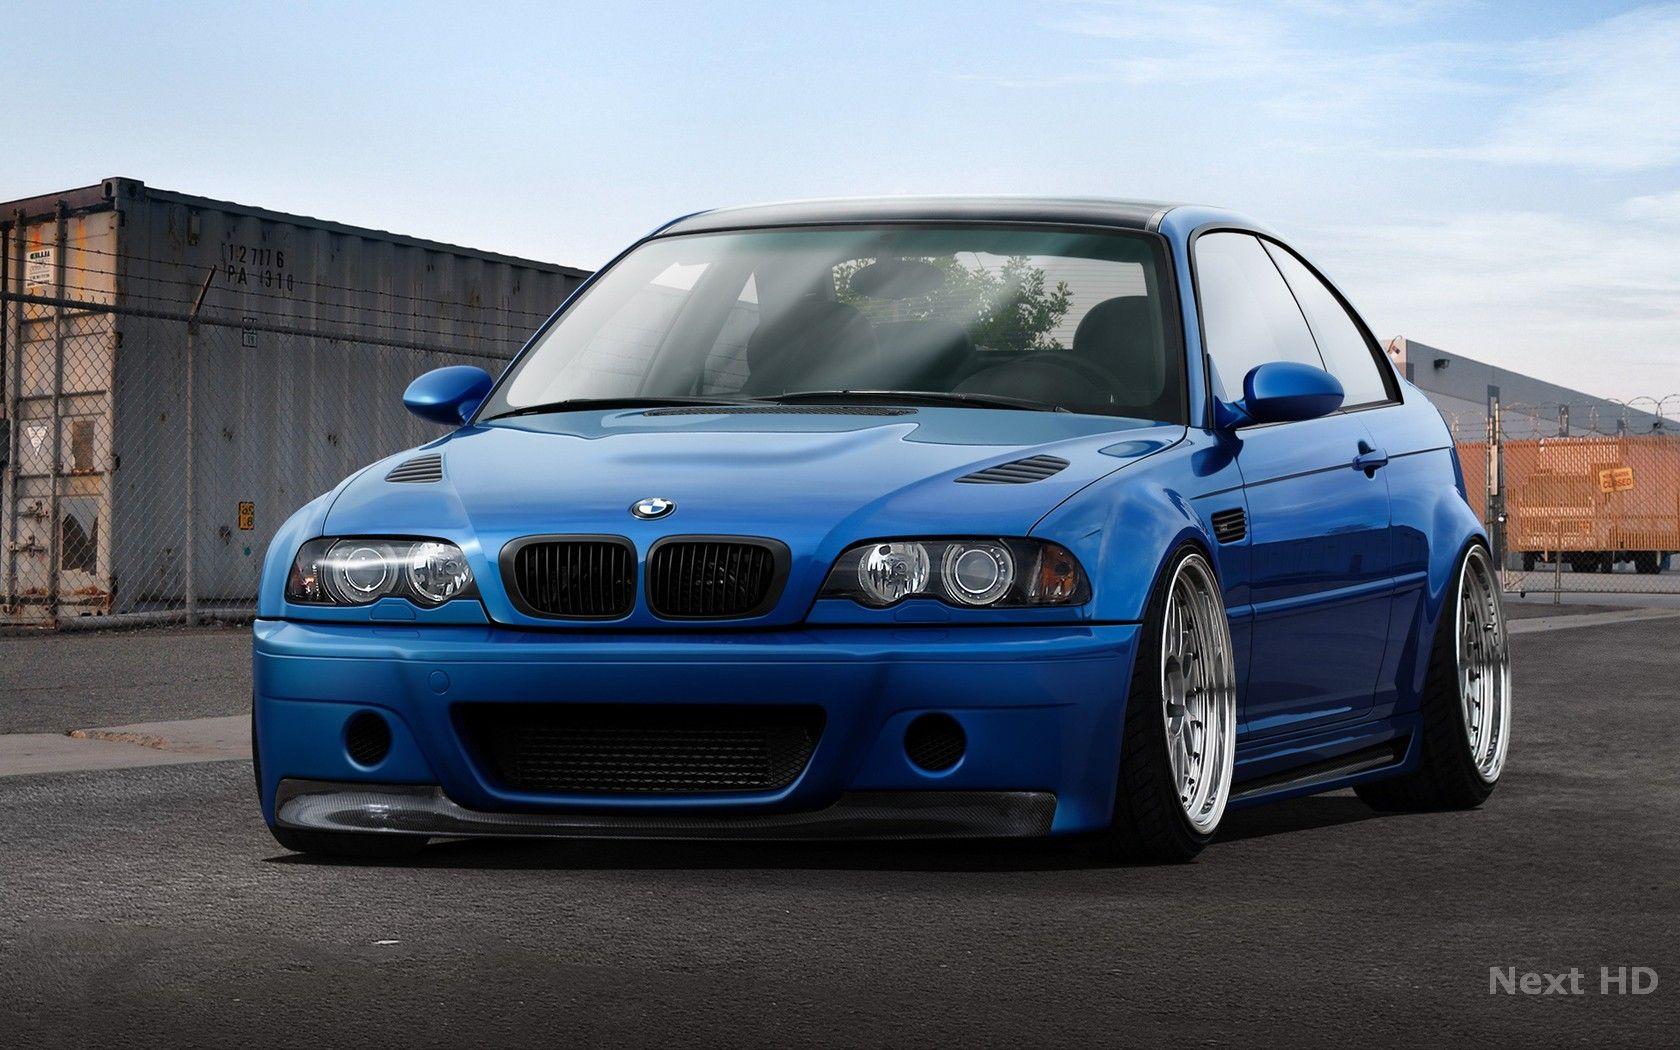 Blue Bmw Hd Wallpapers Bmw Bmw E46 Bmw M3